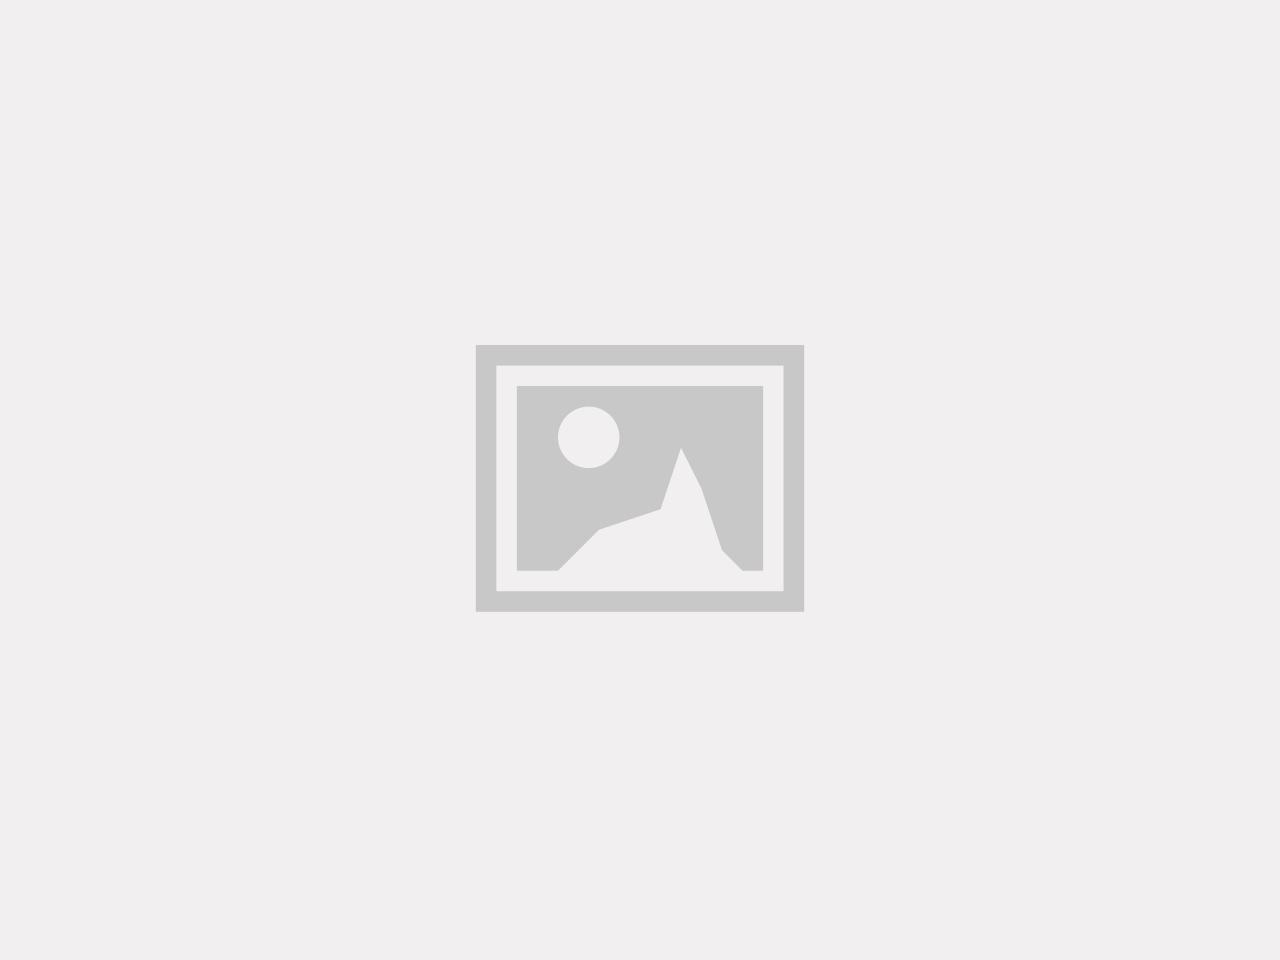 Sidentyg Lila - dubbelsidigt